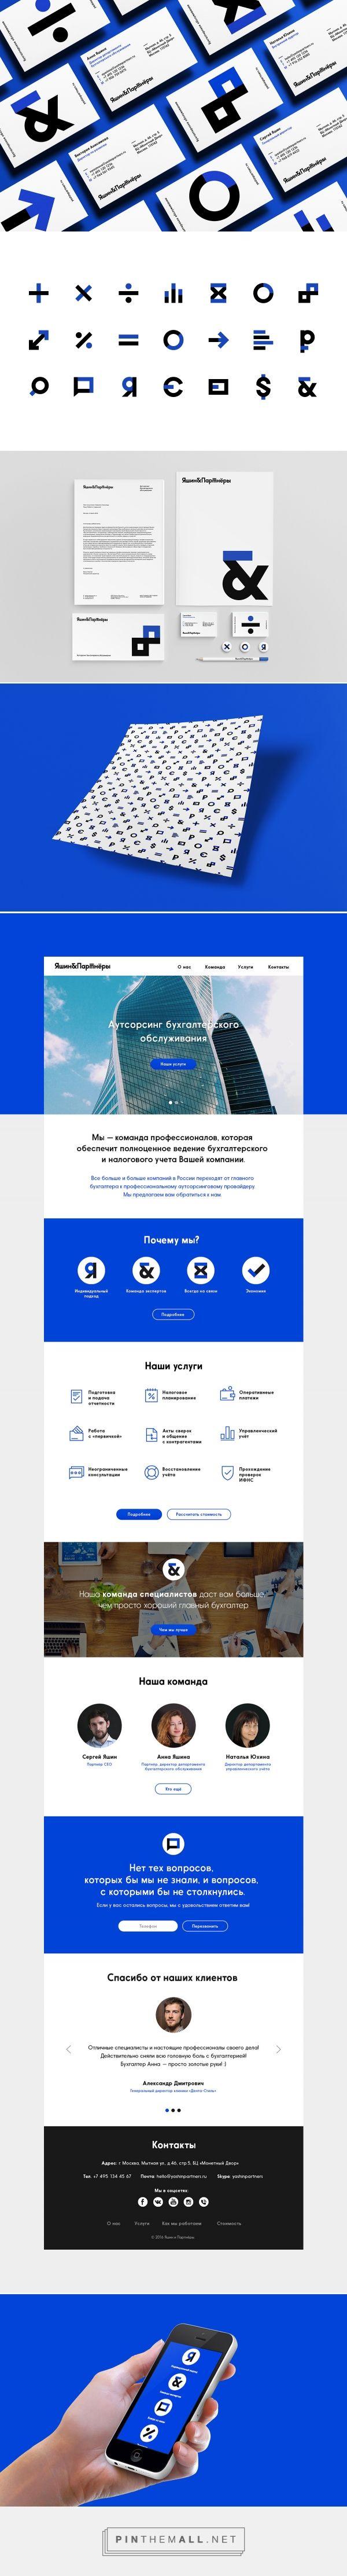 Yashin&Partners on Behance - created via https://pinthemall.net